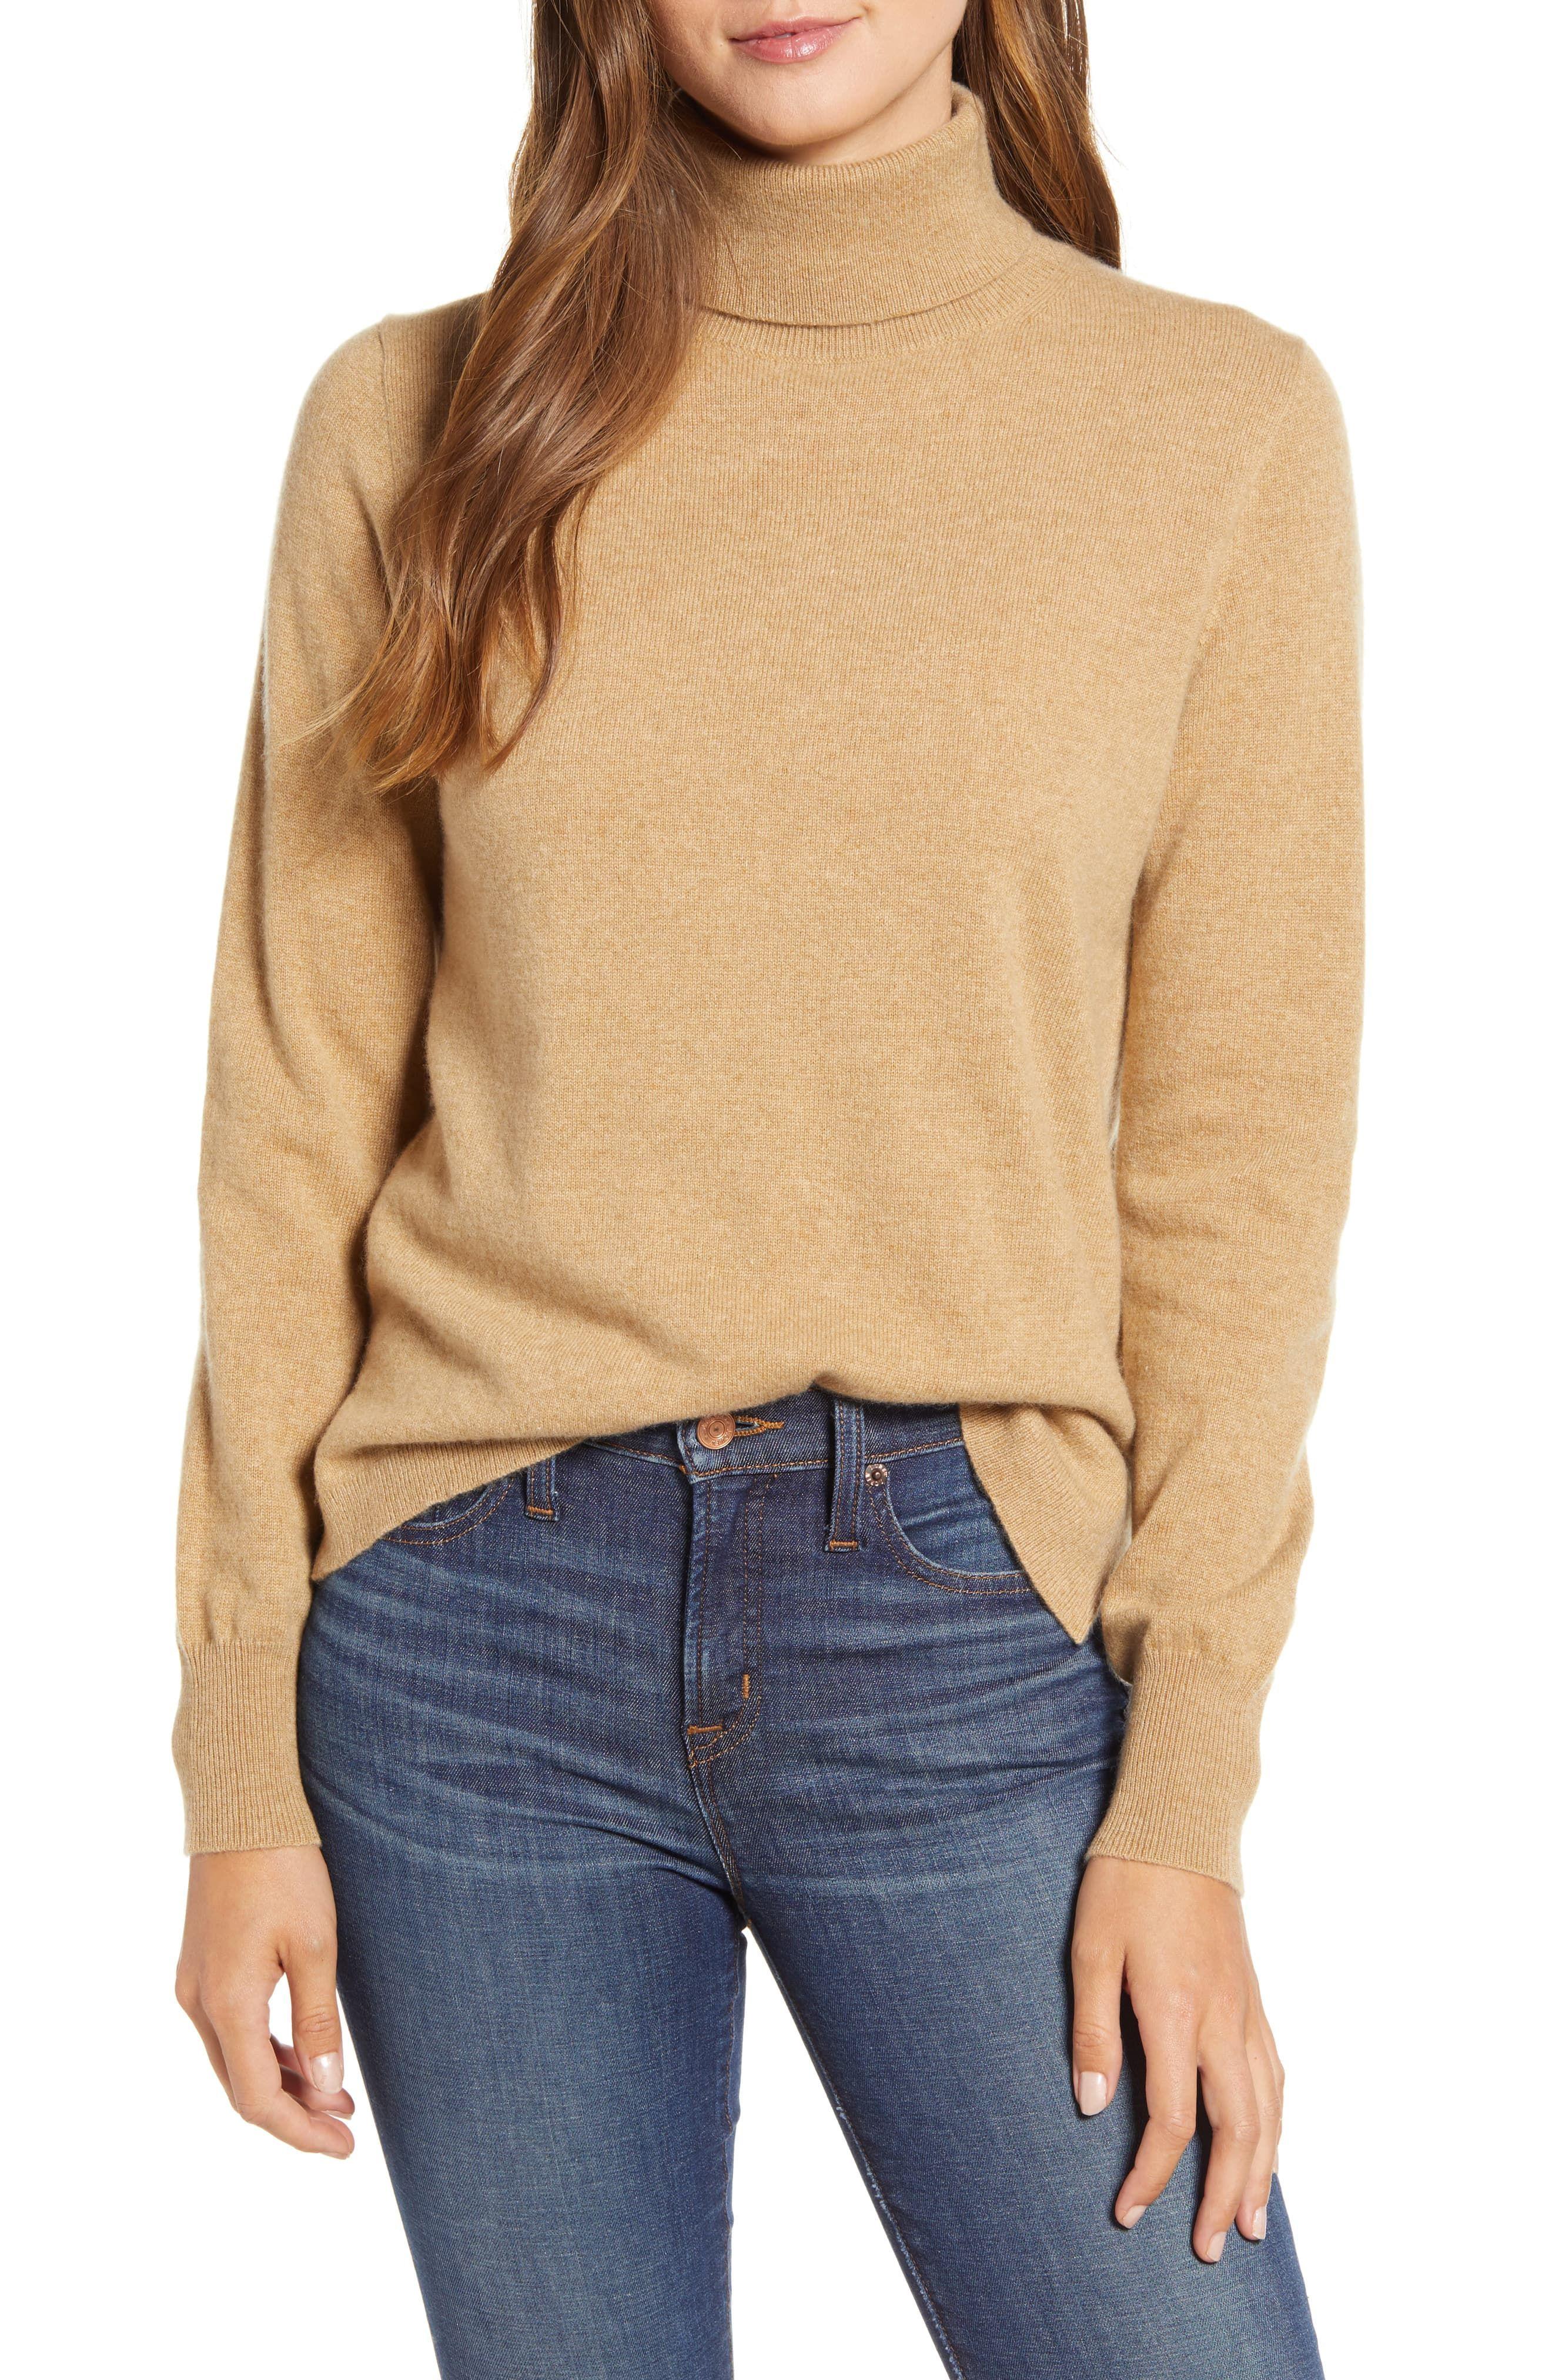 Women's J.crew Everyday Cashmere Turtleneck Sweater, Size